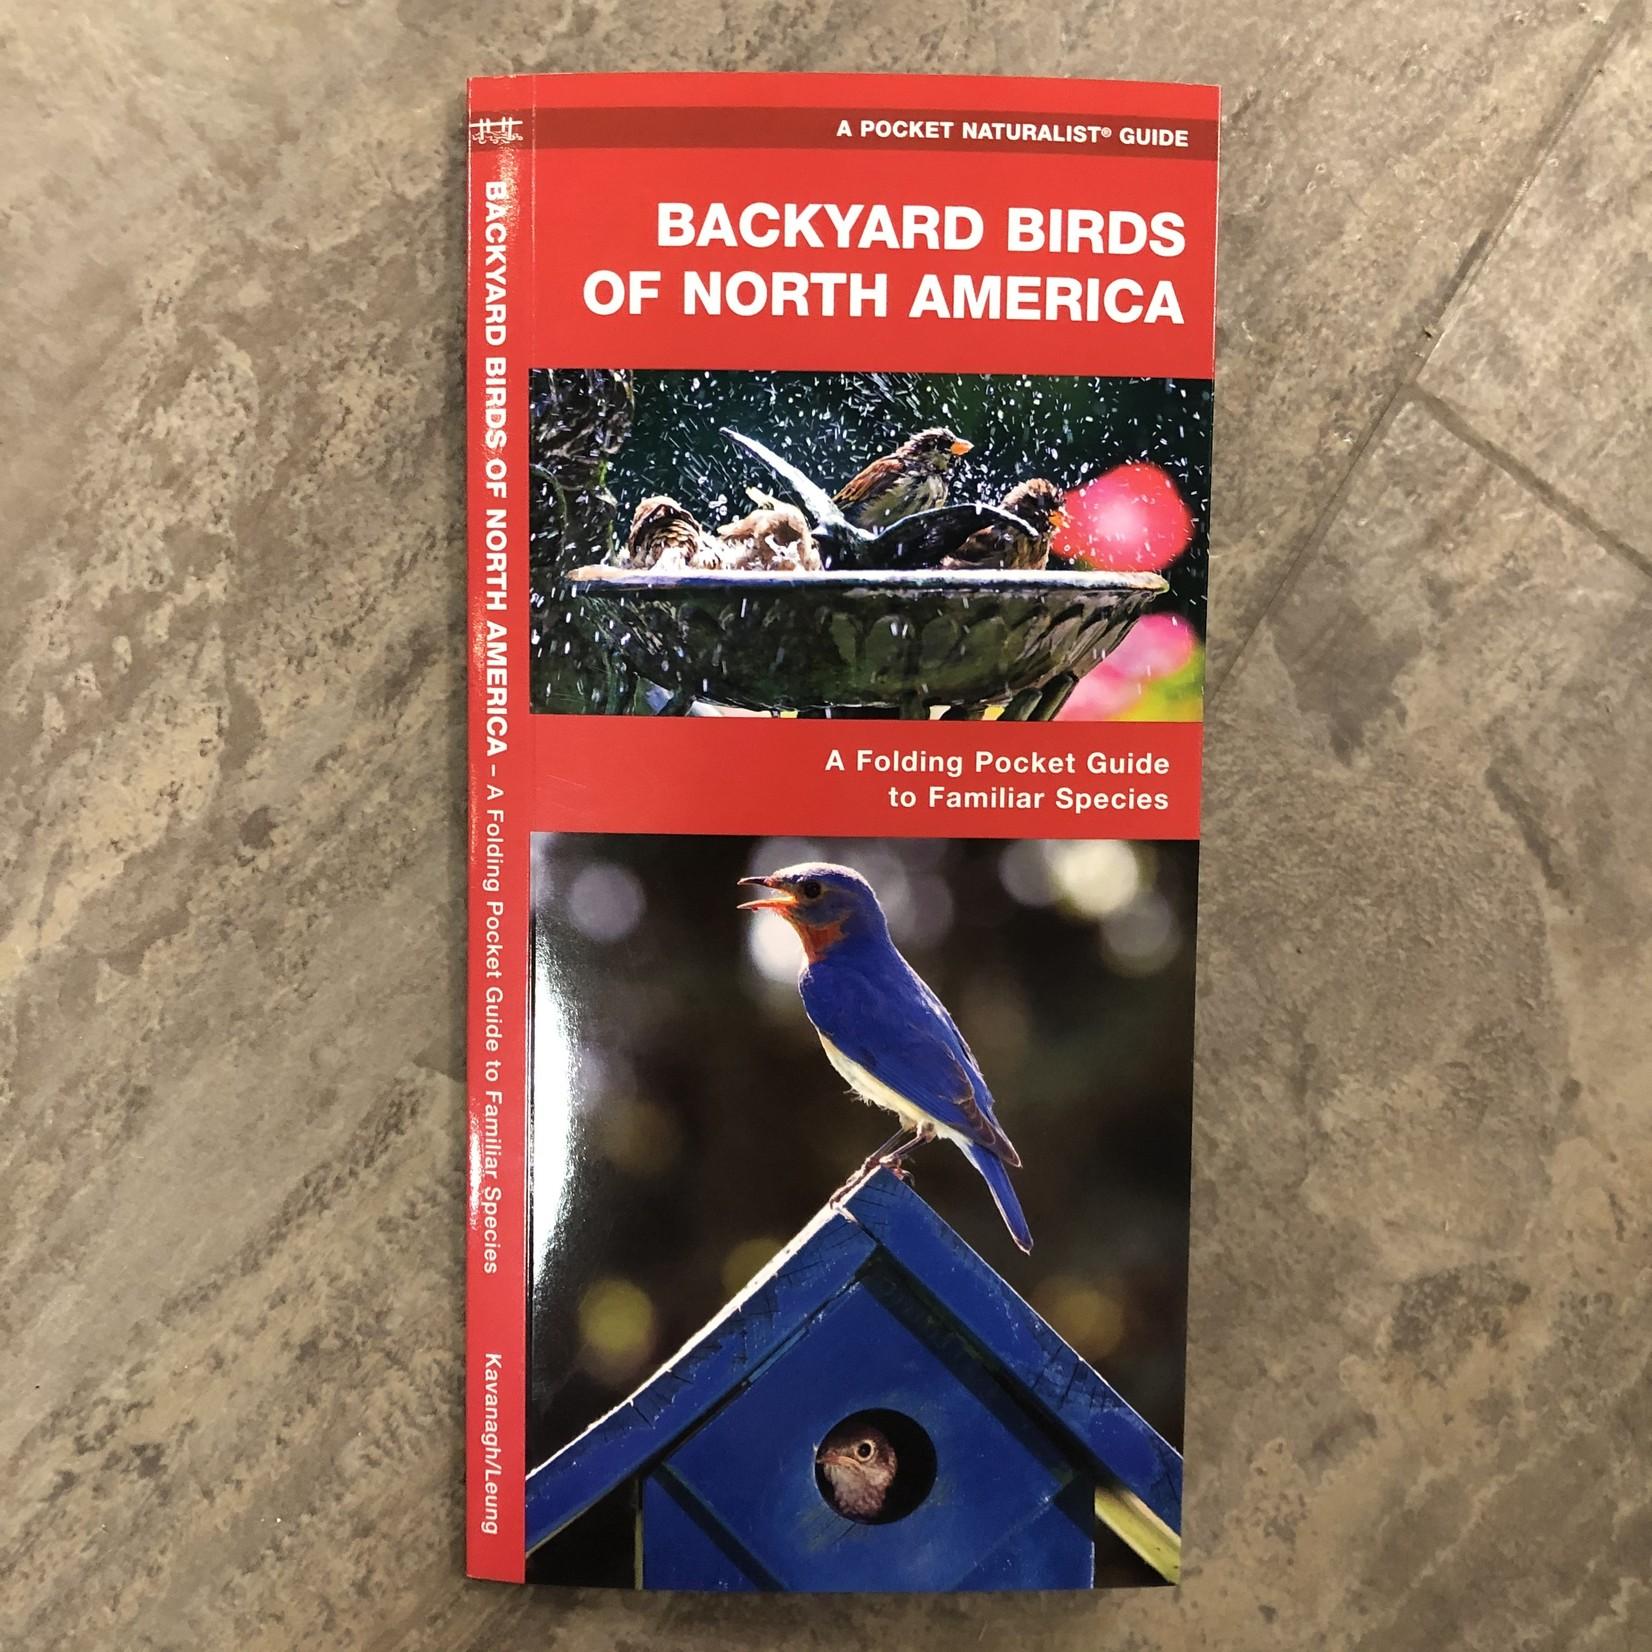 Folding Pocket Guide: Backyard Birds of North America